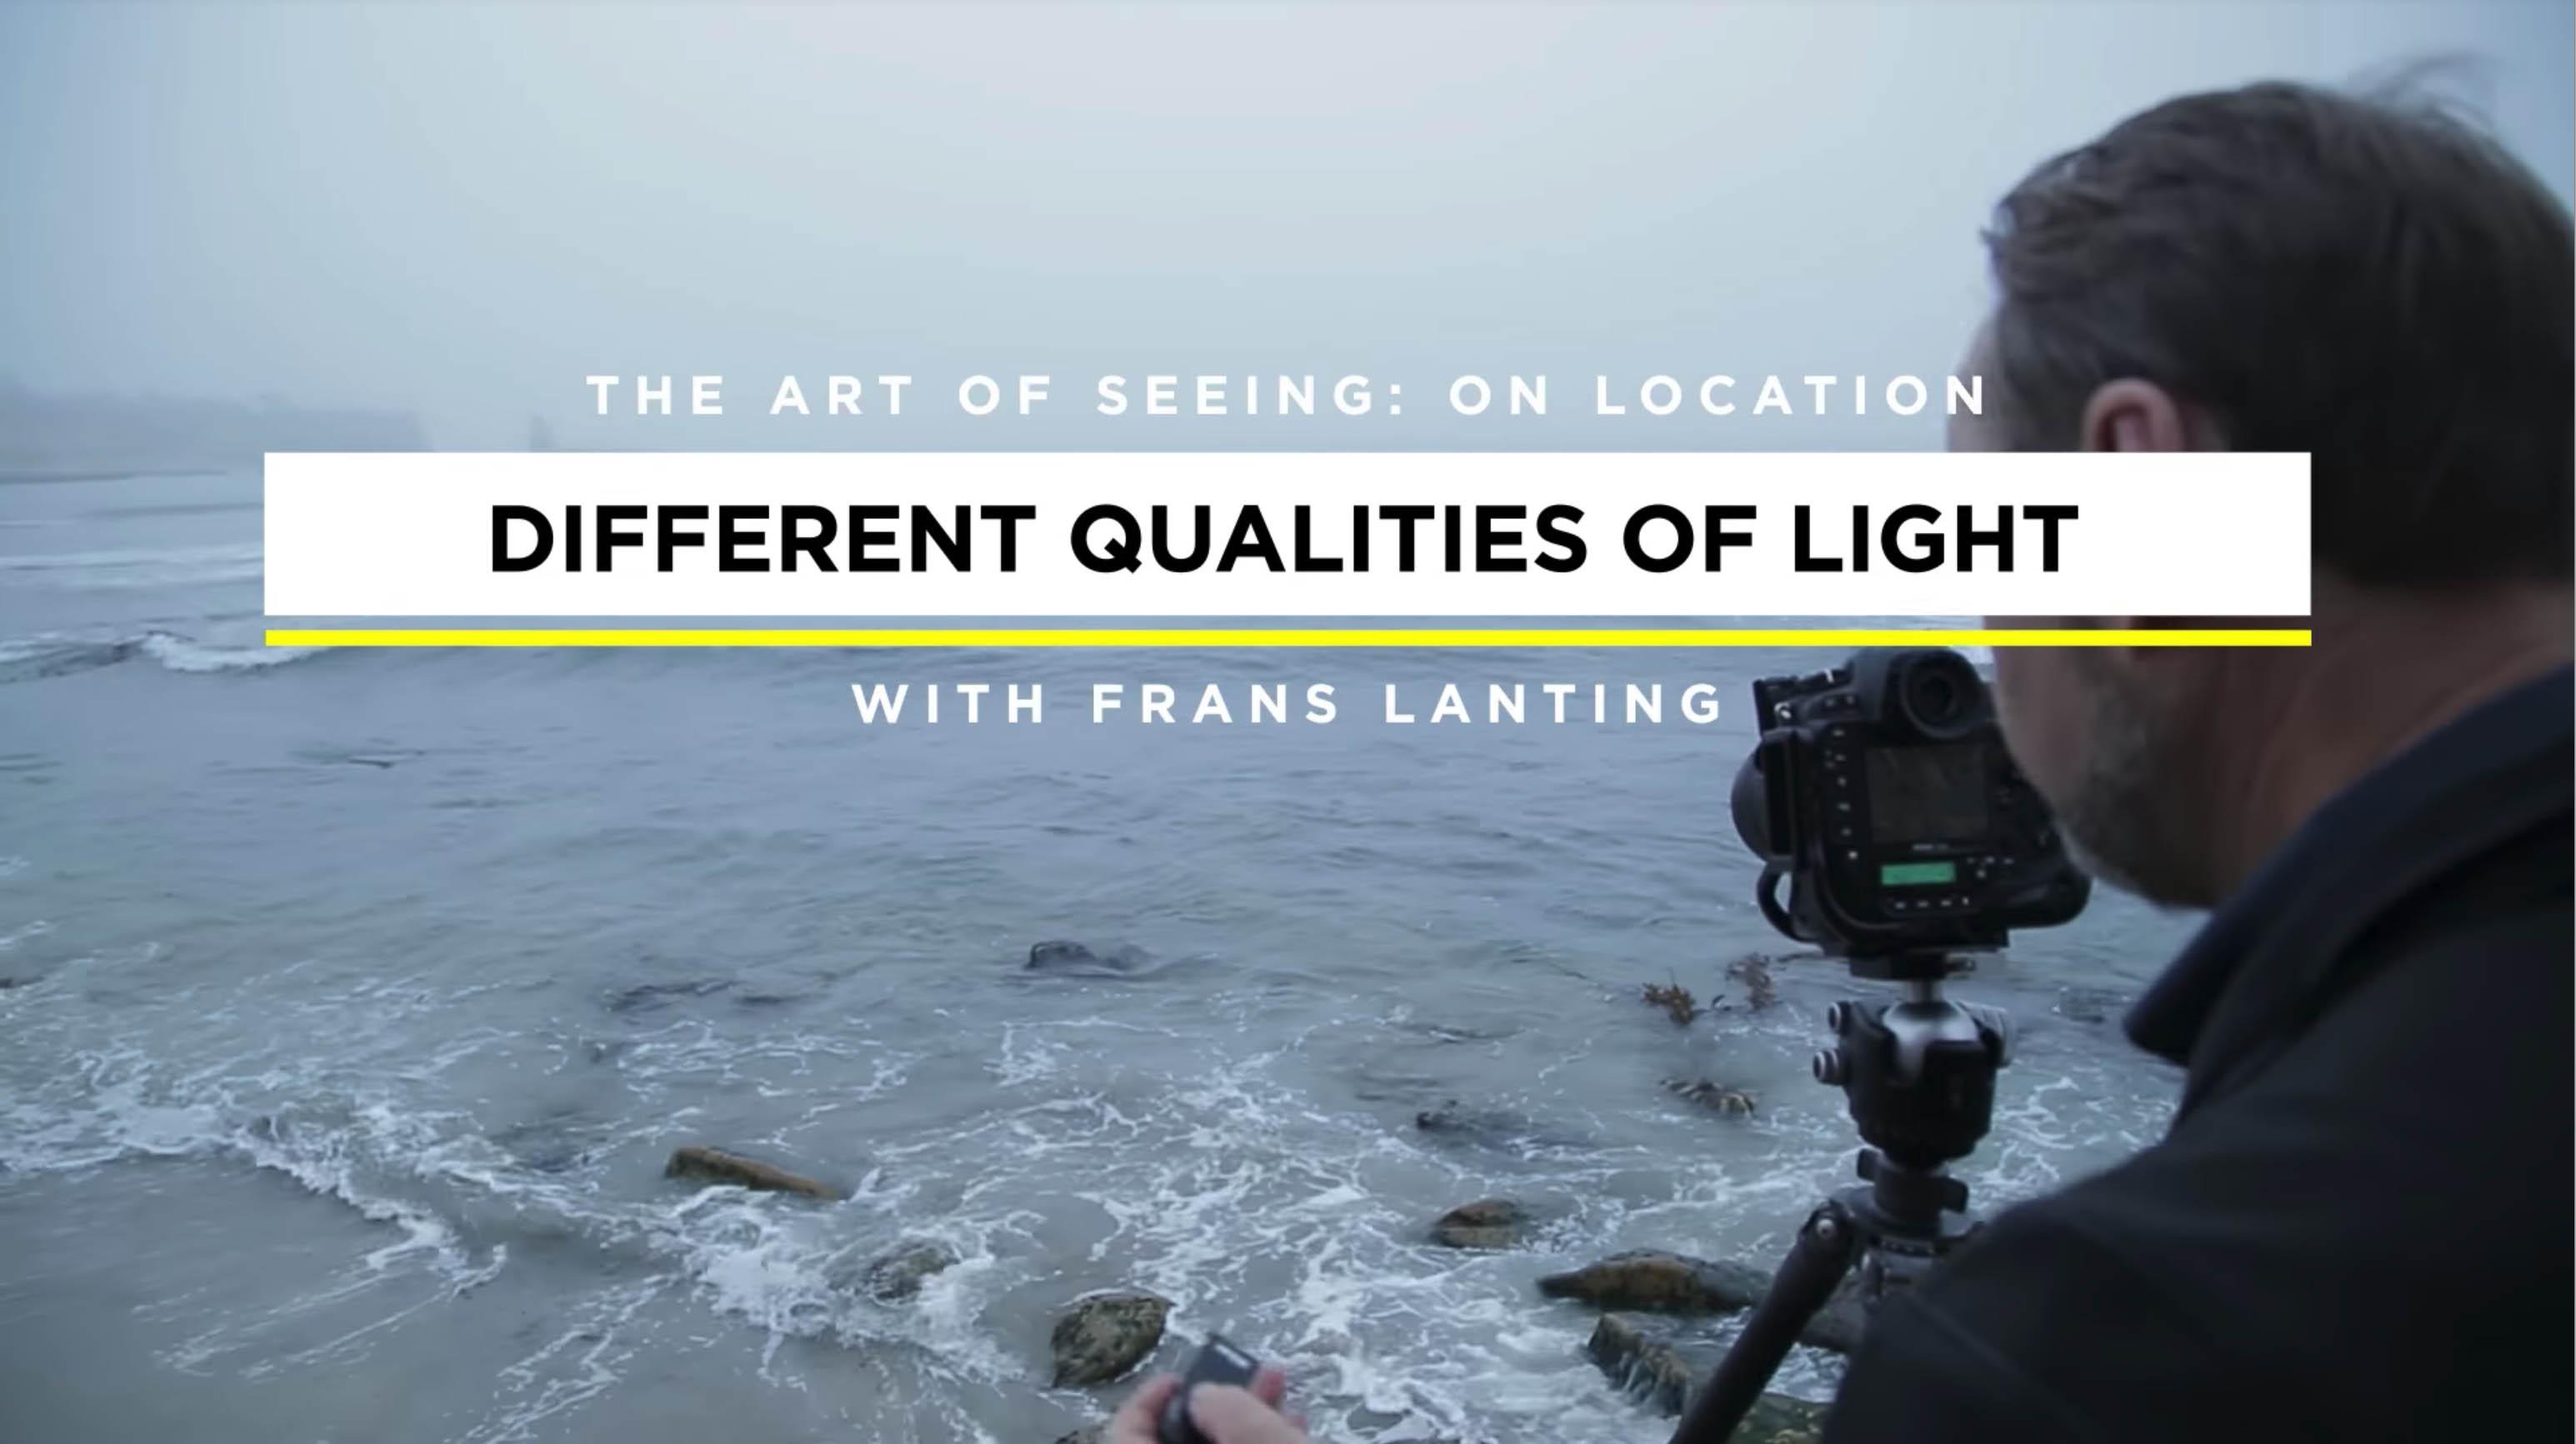 Frans Lanting